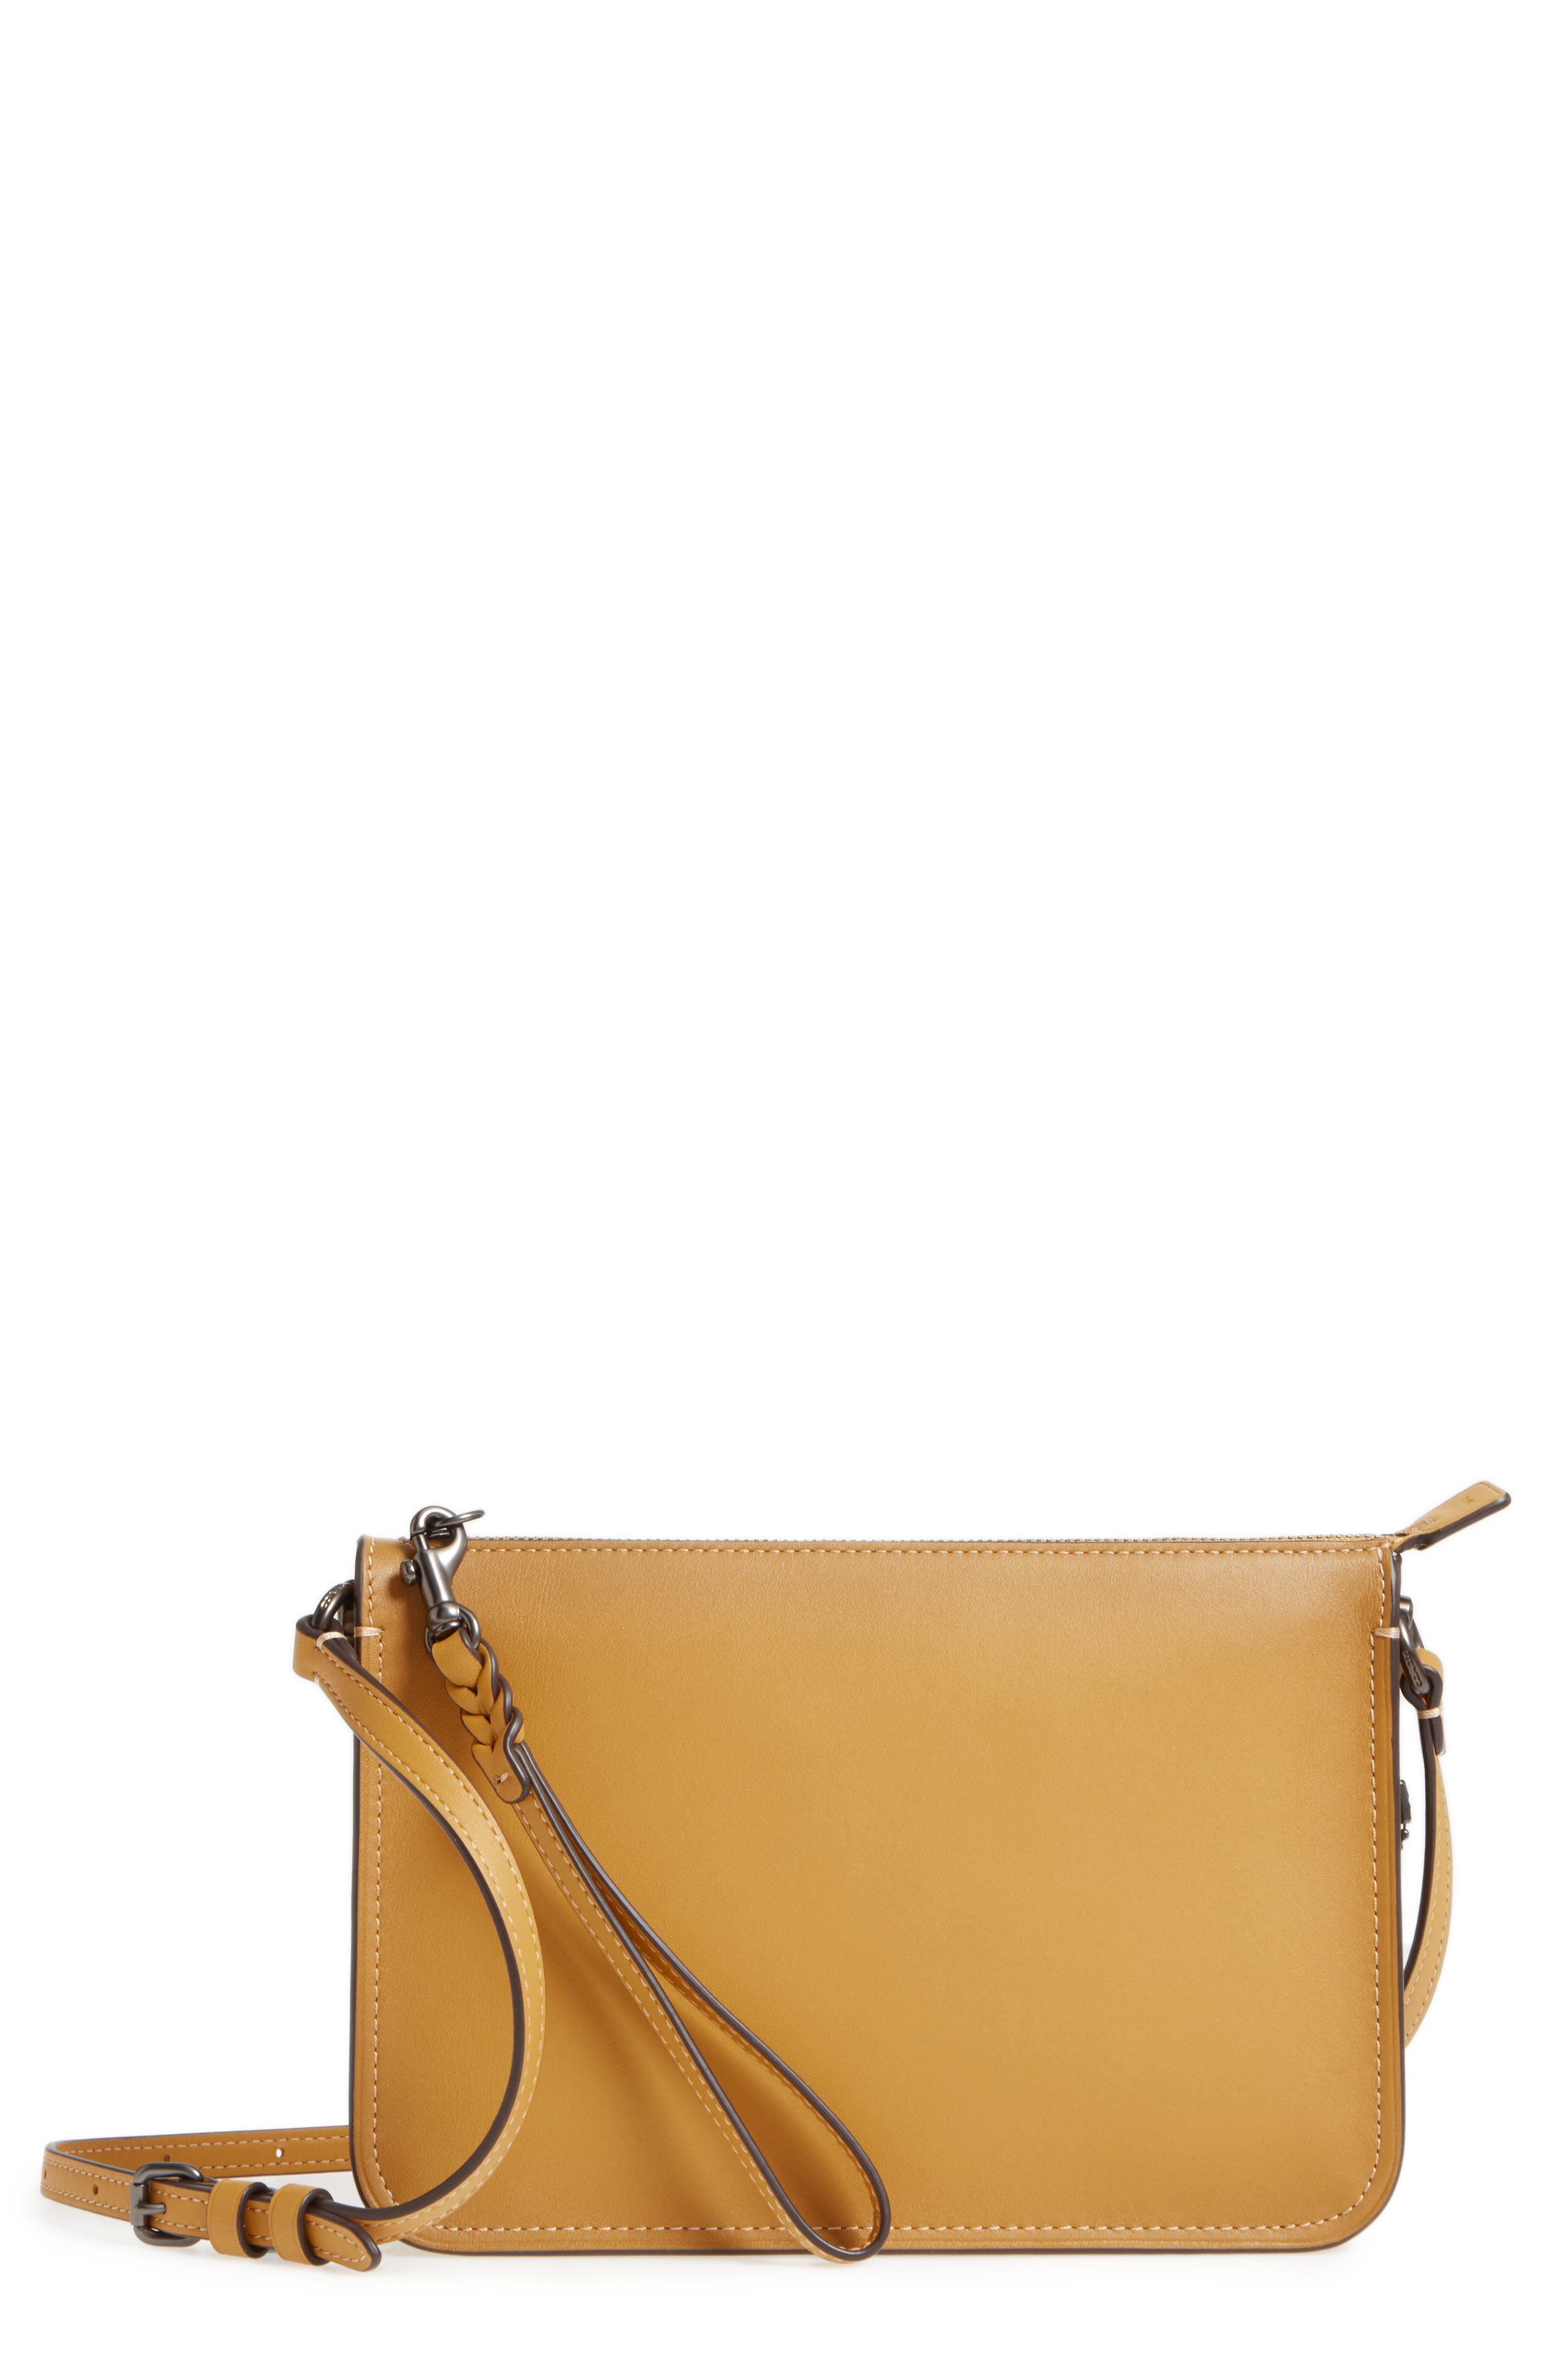 COACH 1941 Soho Leather Crossbody Bag